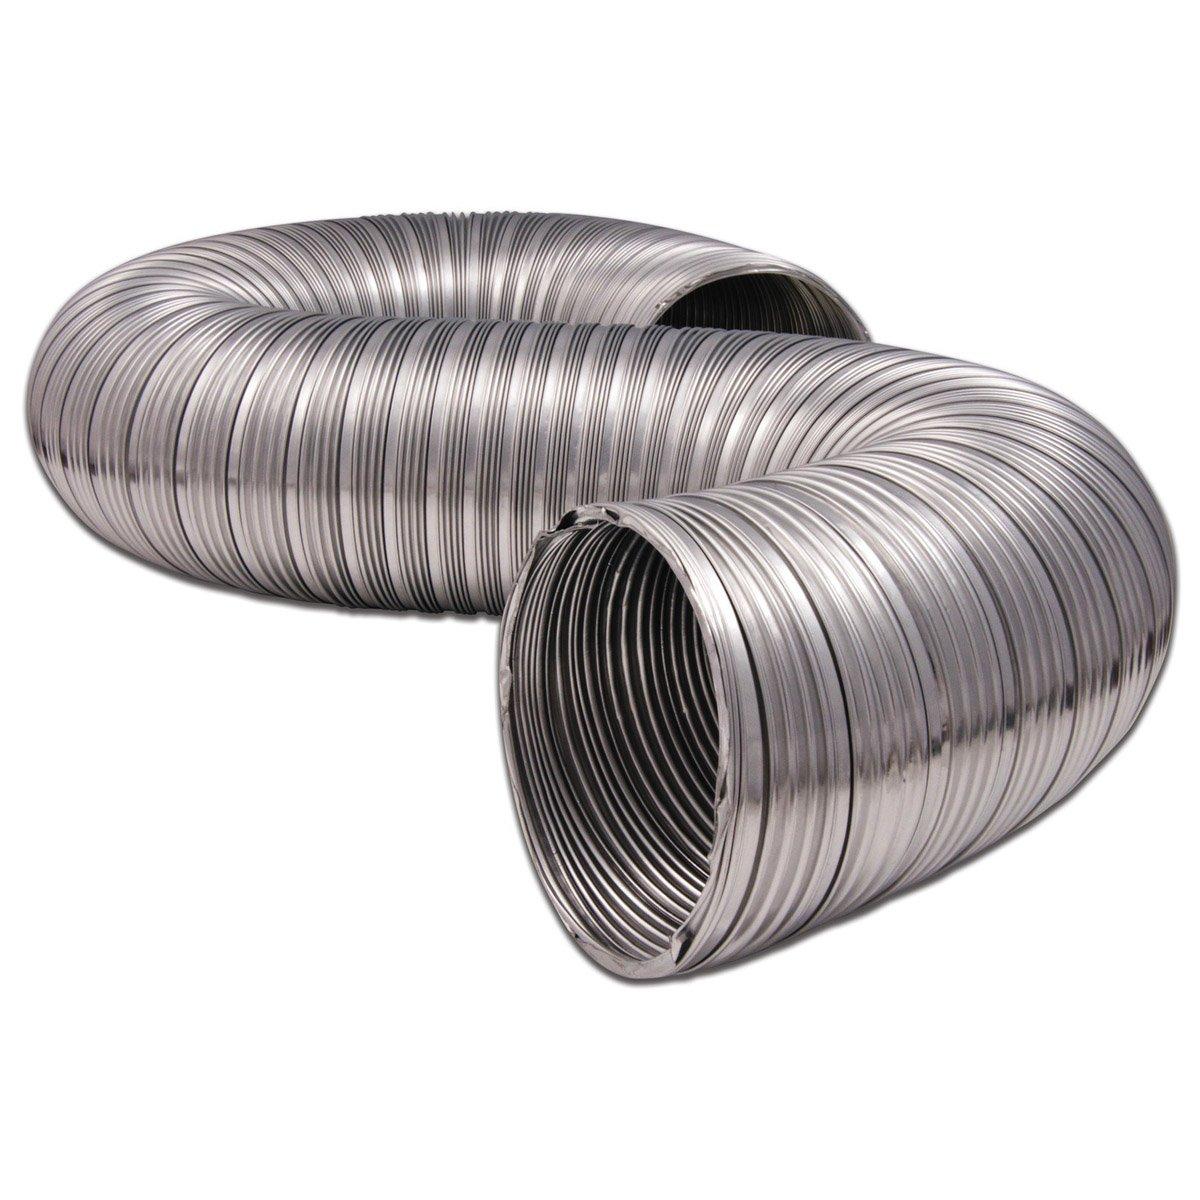 "ducto flexible 4"" x 2.40"